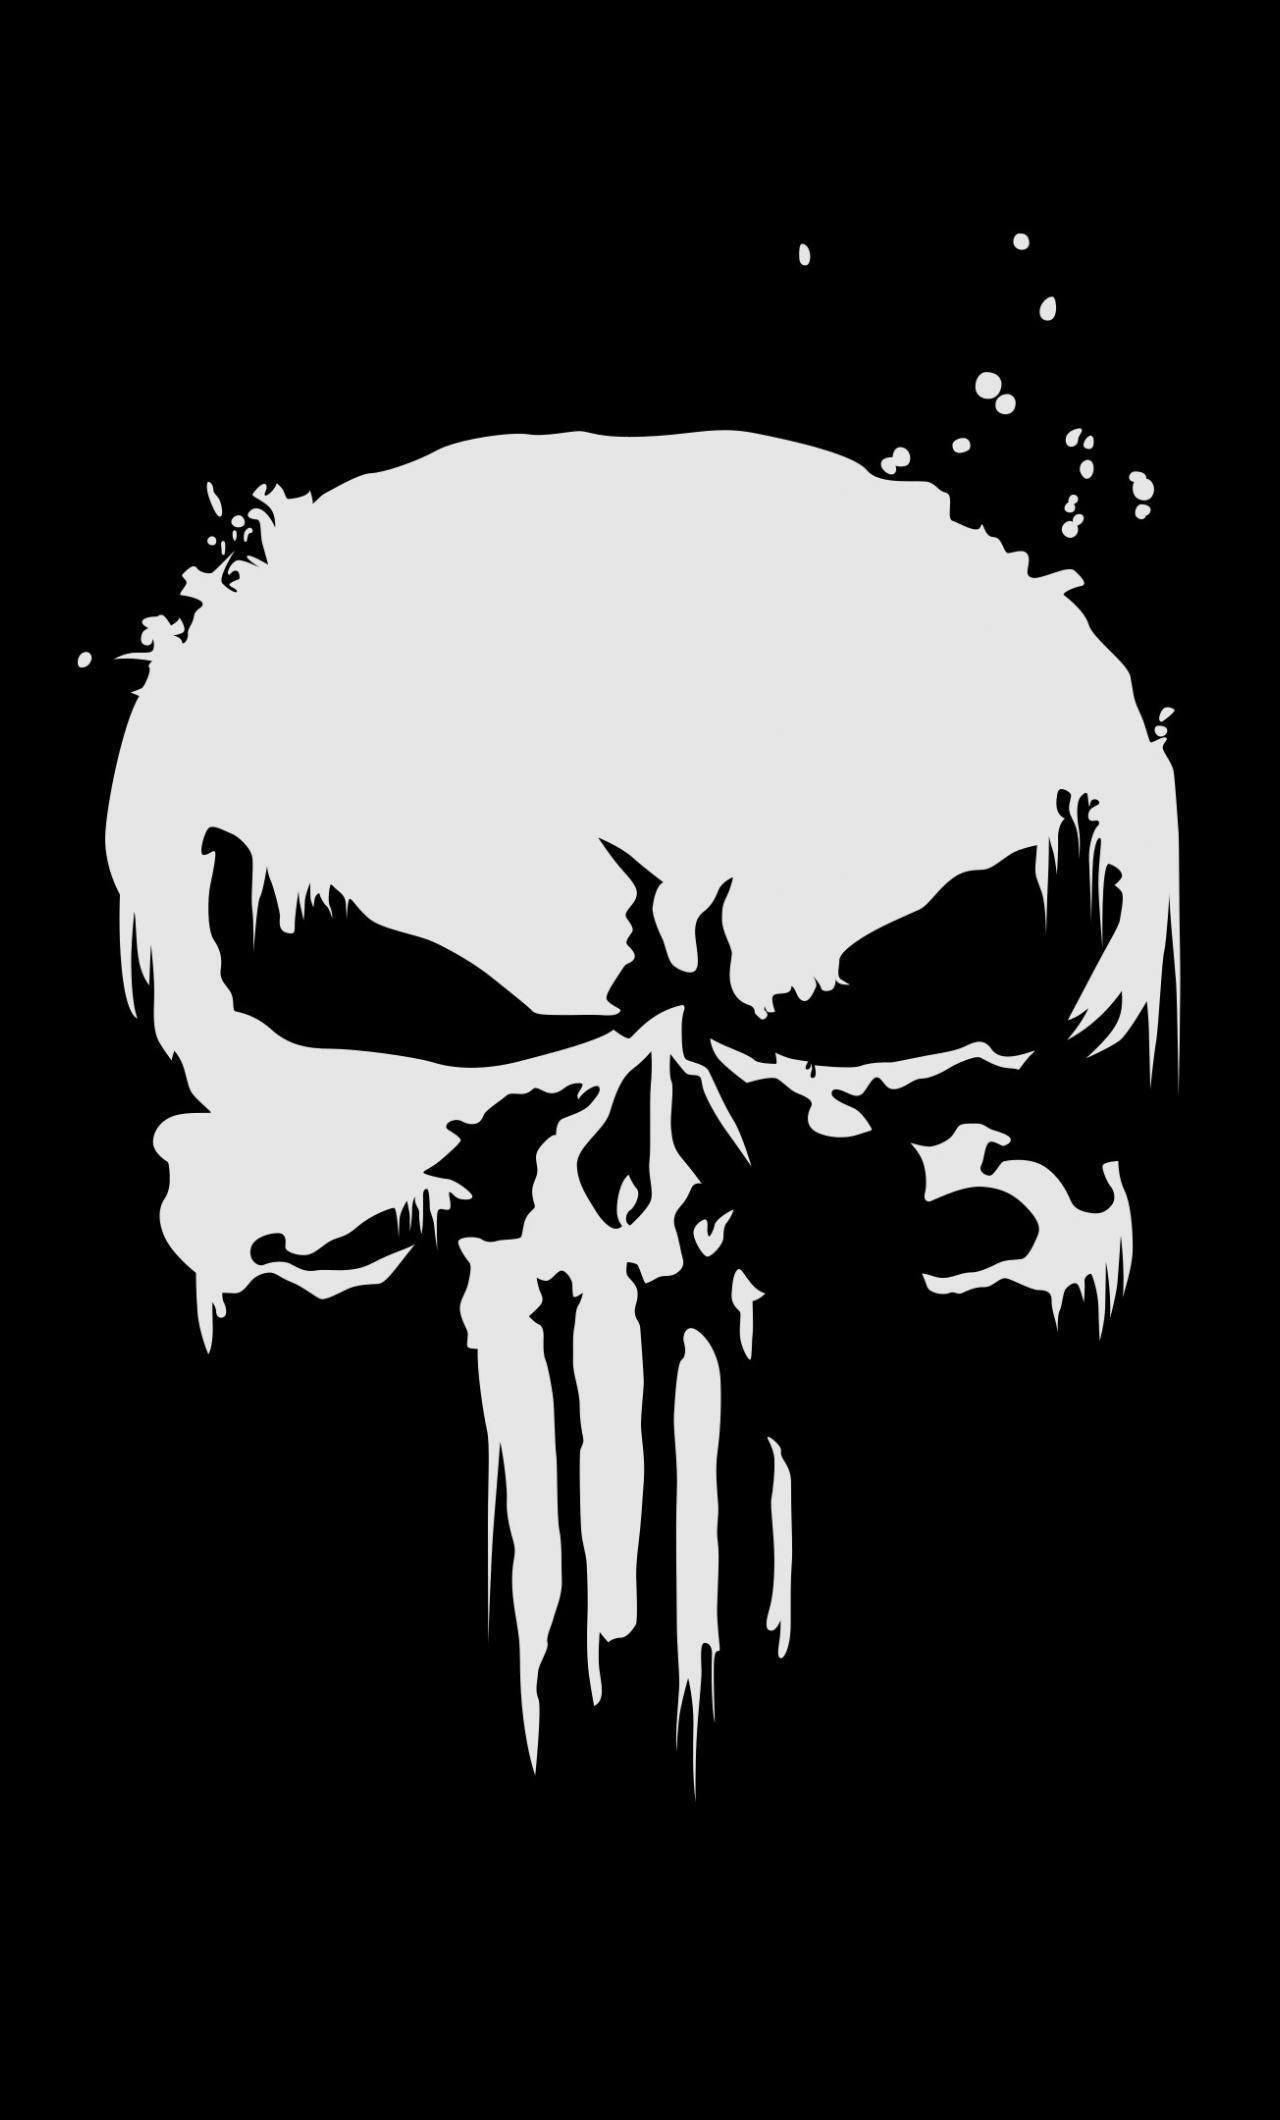 Download 1280x2120 wallpaper the punisher logo skull - Skull wallpaper iphone 6 ...